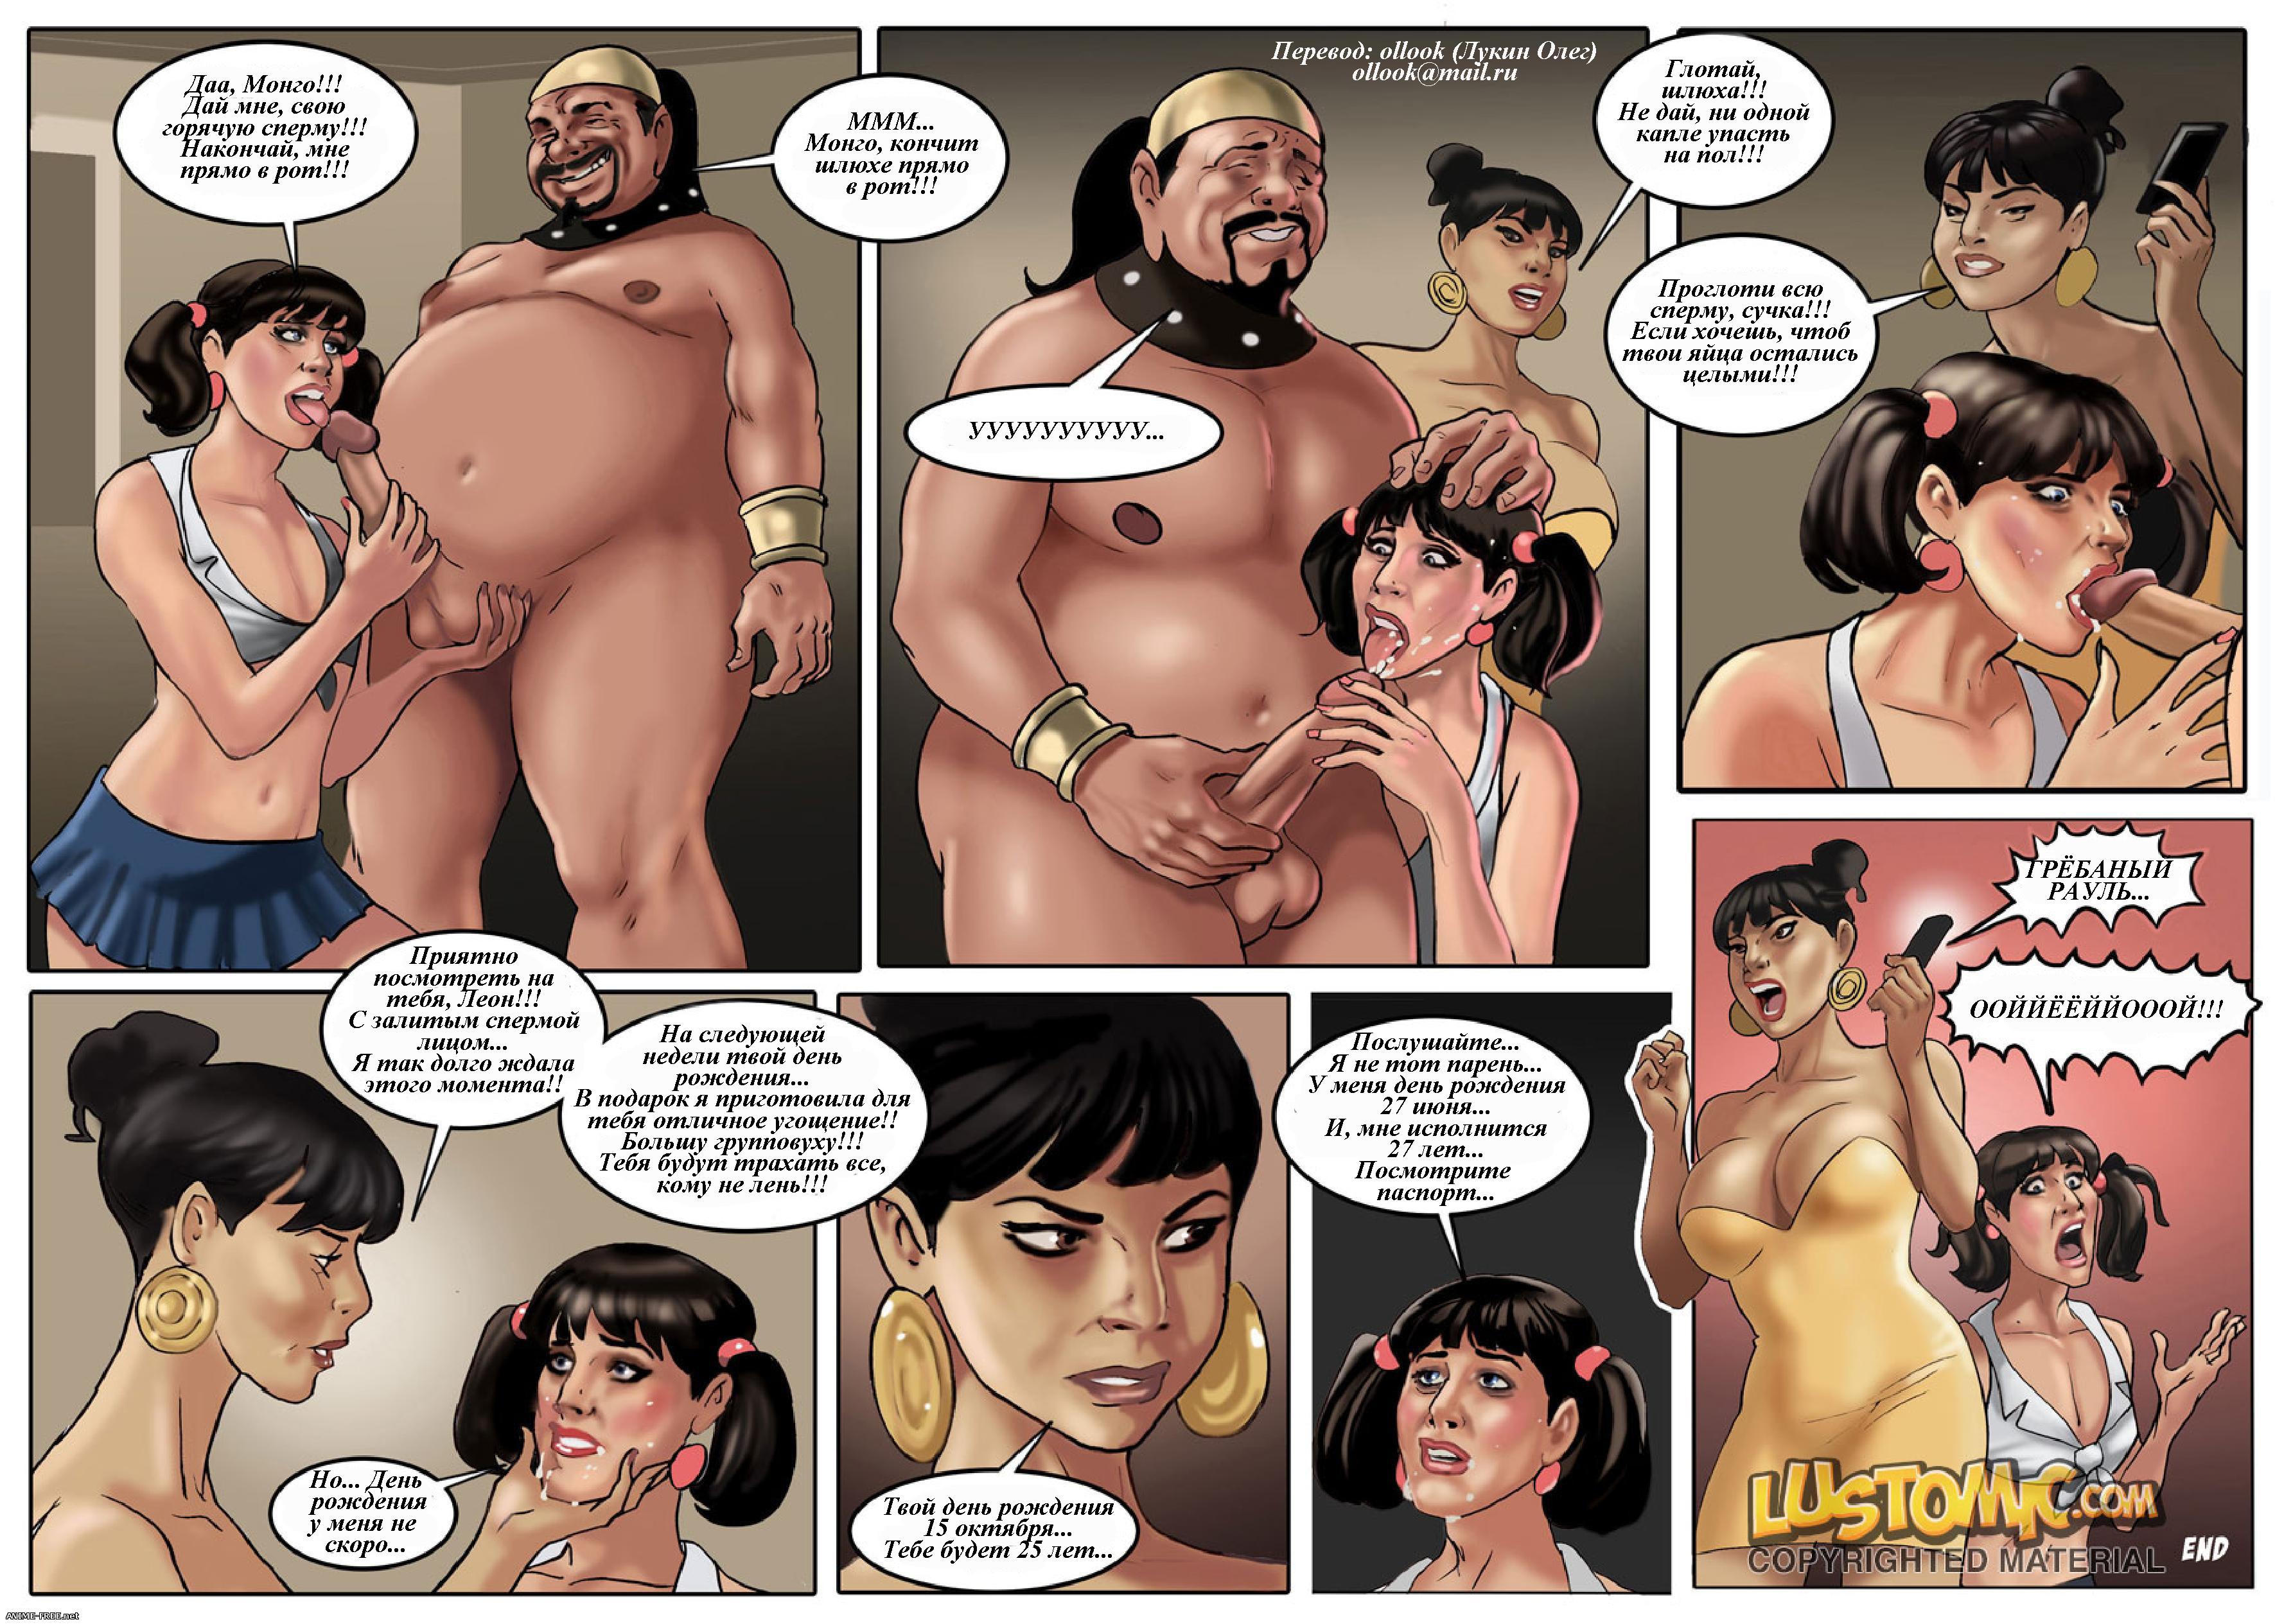 Sexwife & Cuckold. Часть - 6 (Part - 6) [Uncen] [RUS] Porn Comics